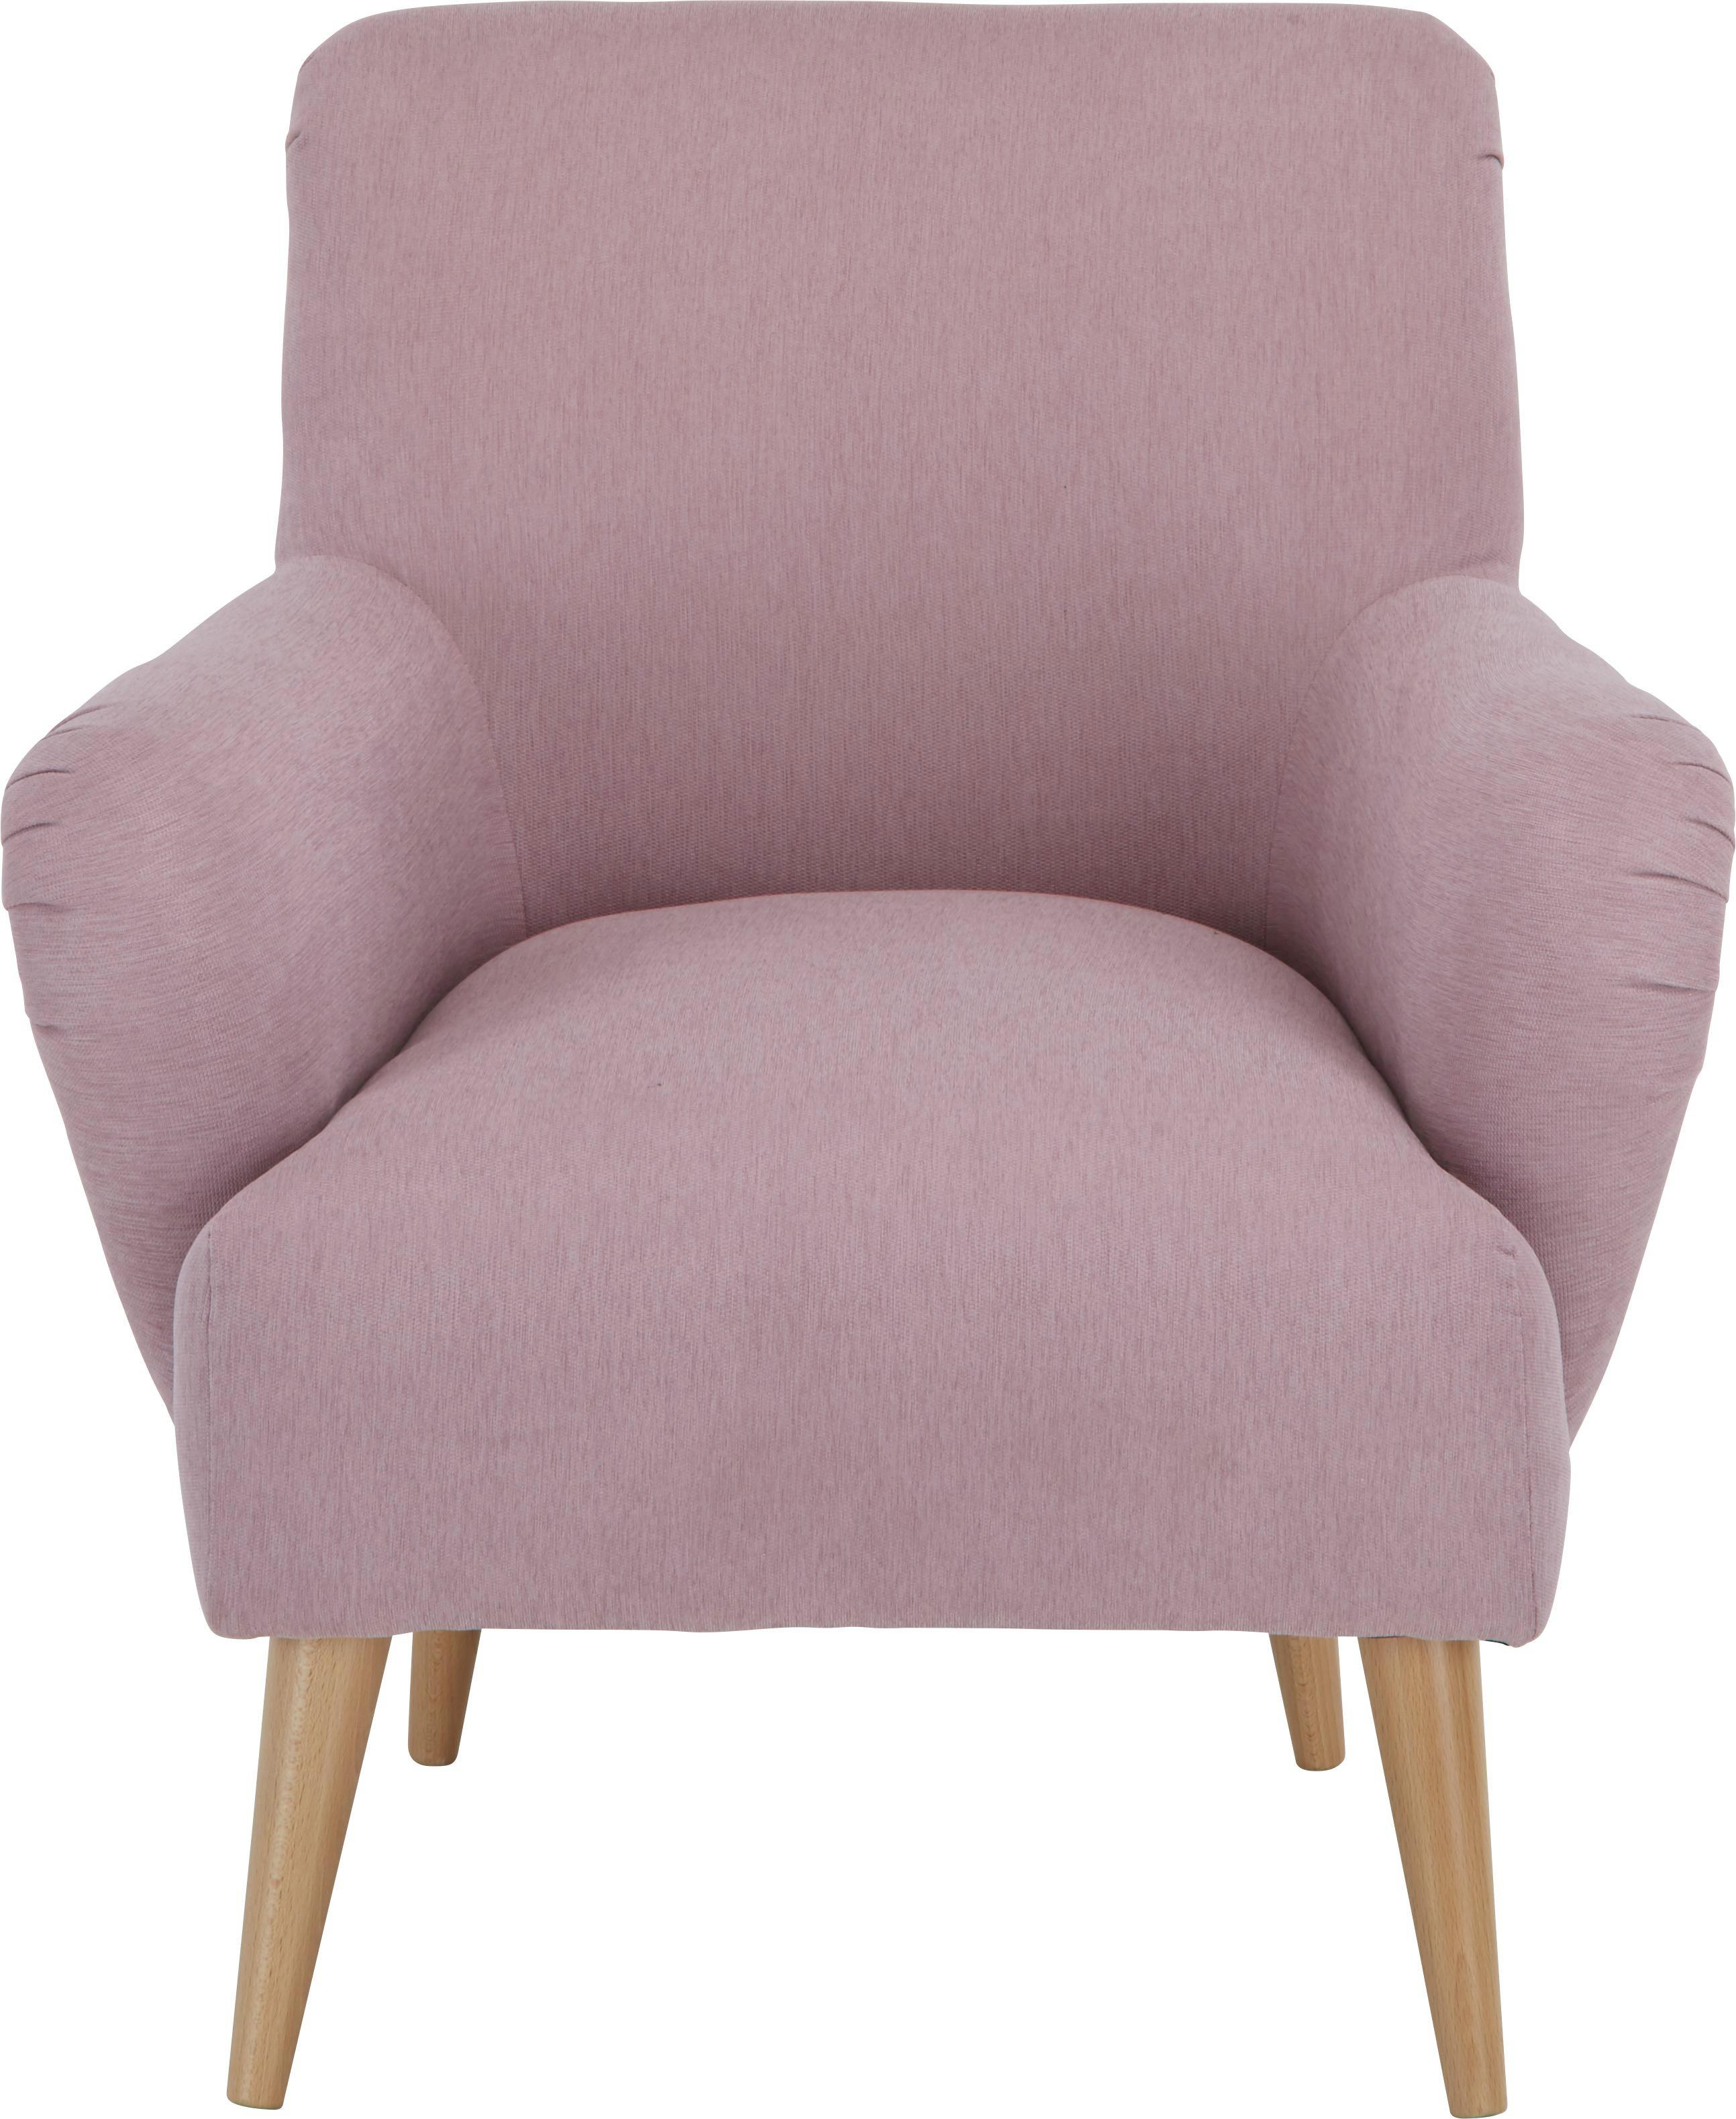 Sessel in Altrosa - Altrosa/Naturfarben, LIFESTYLE, Textil (77/82/44/78cm) - MÖMAX modern living